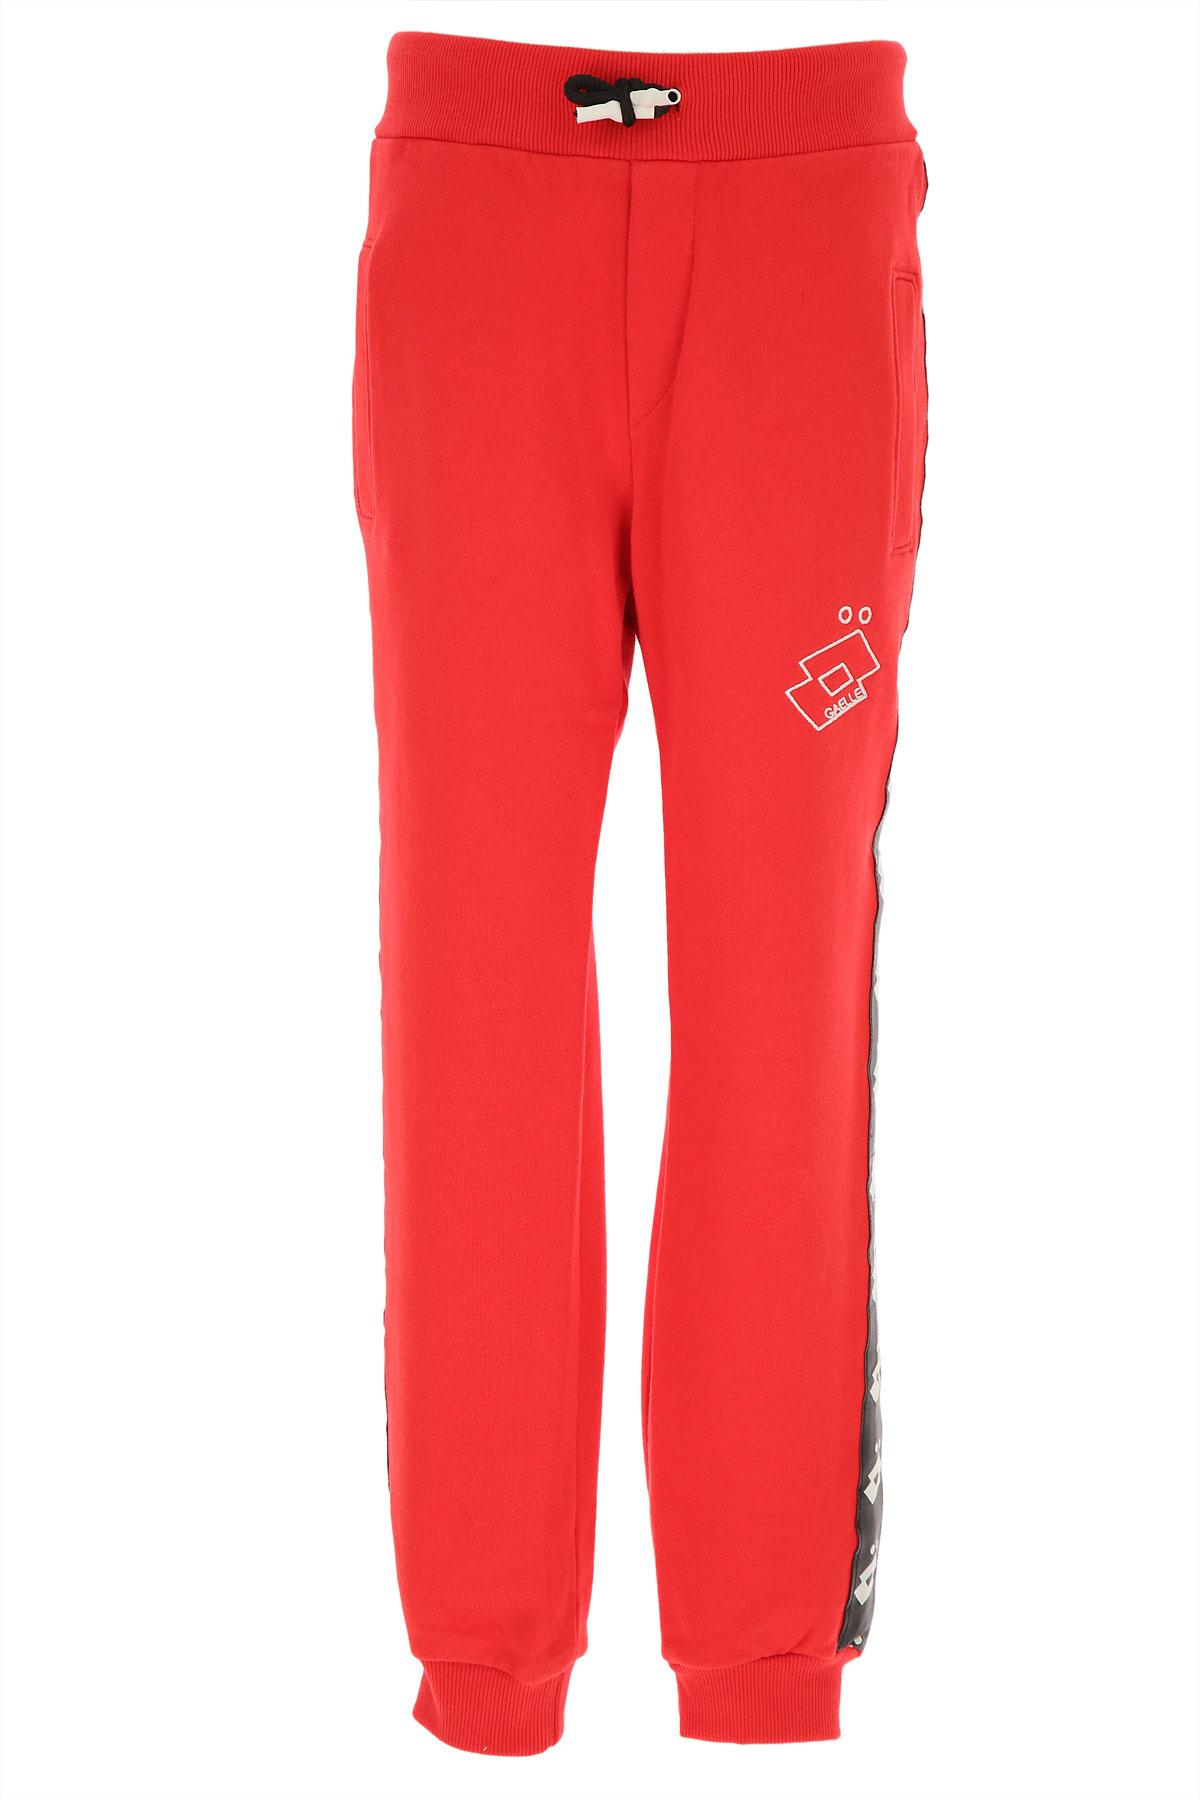 Gaelle Kids Sweatpants for Girls On Sale, Red, Cotton, 2019, 12Y 14Y 16Y 4Y 6Y